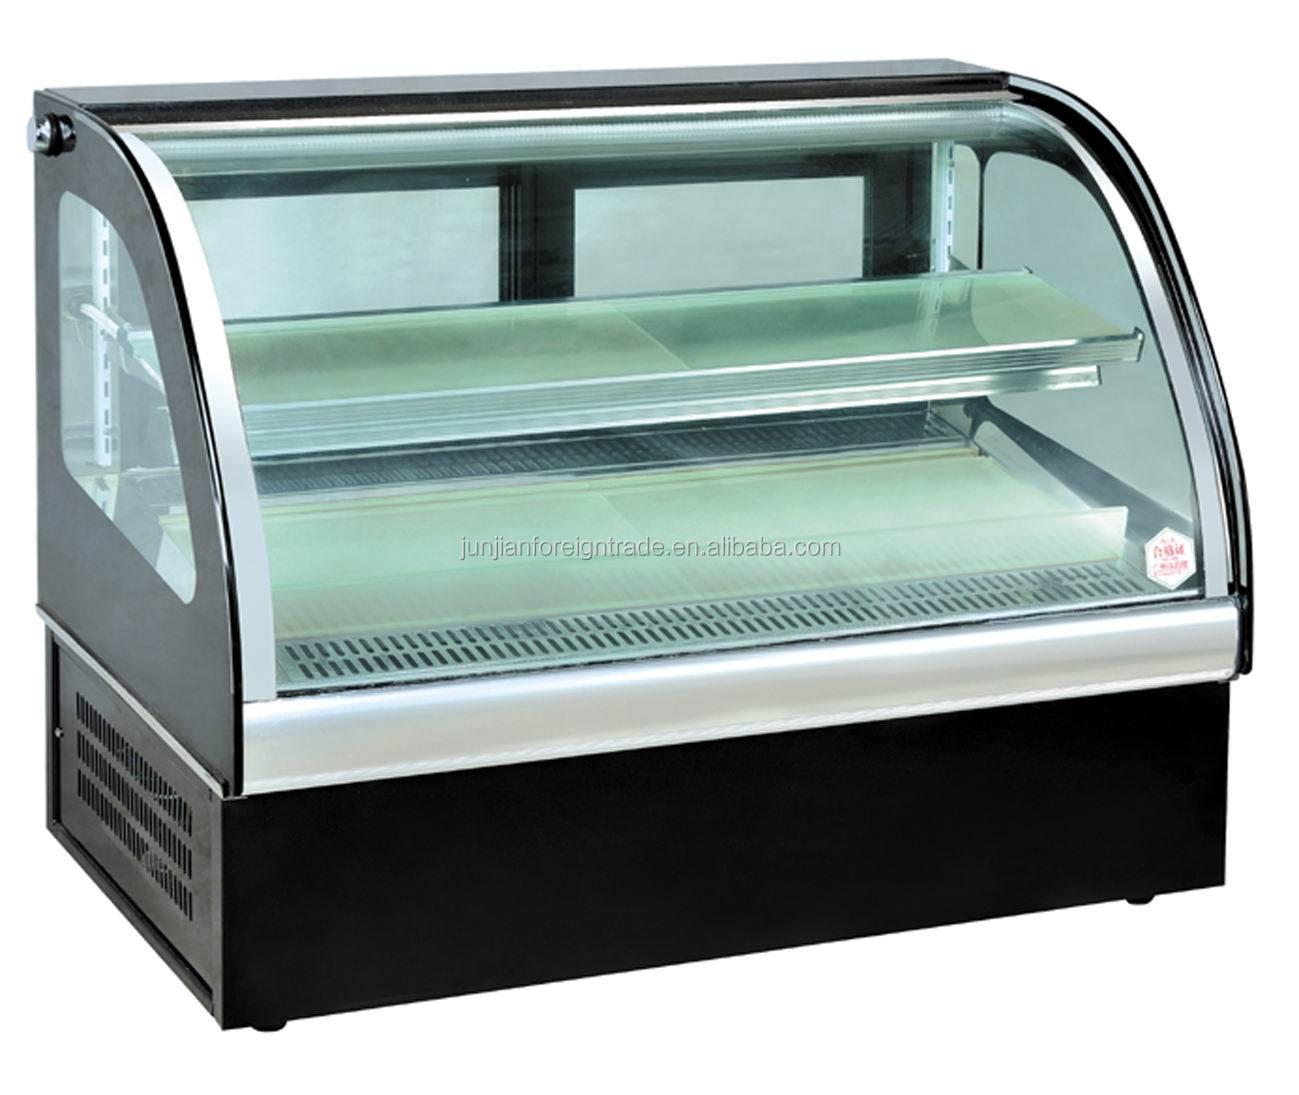 Mini Display Freezer Showcase Freezer For Restaurant